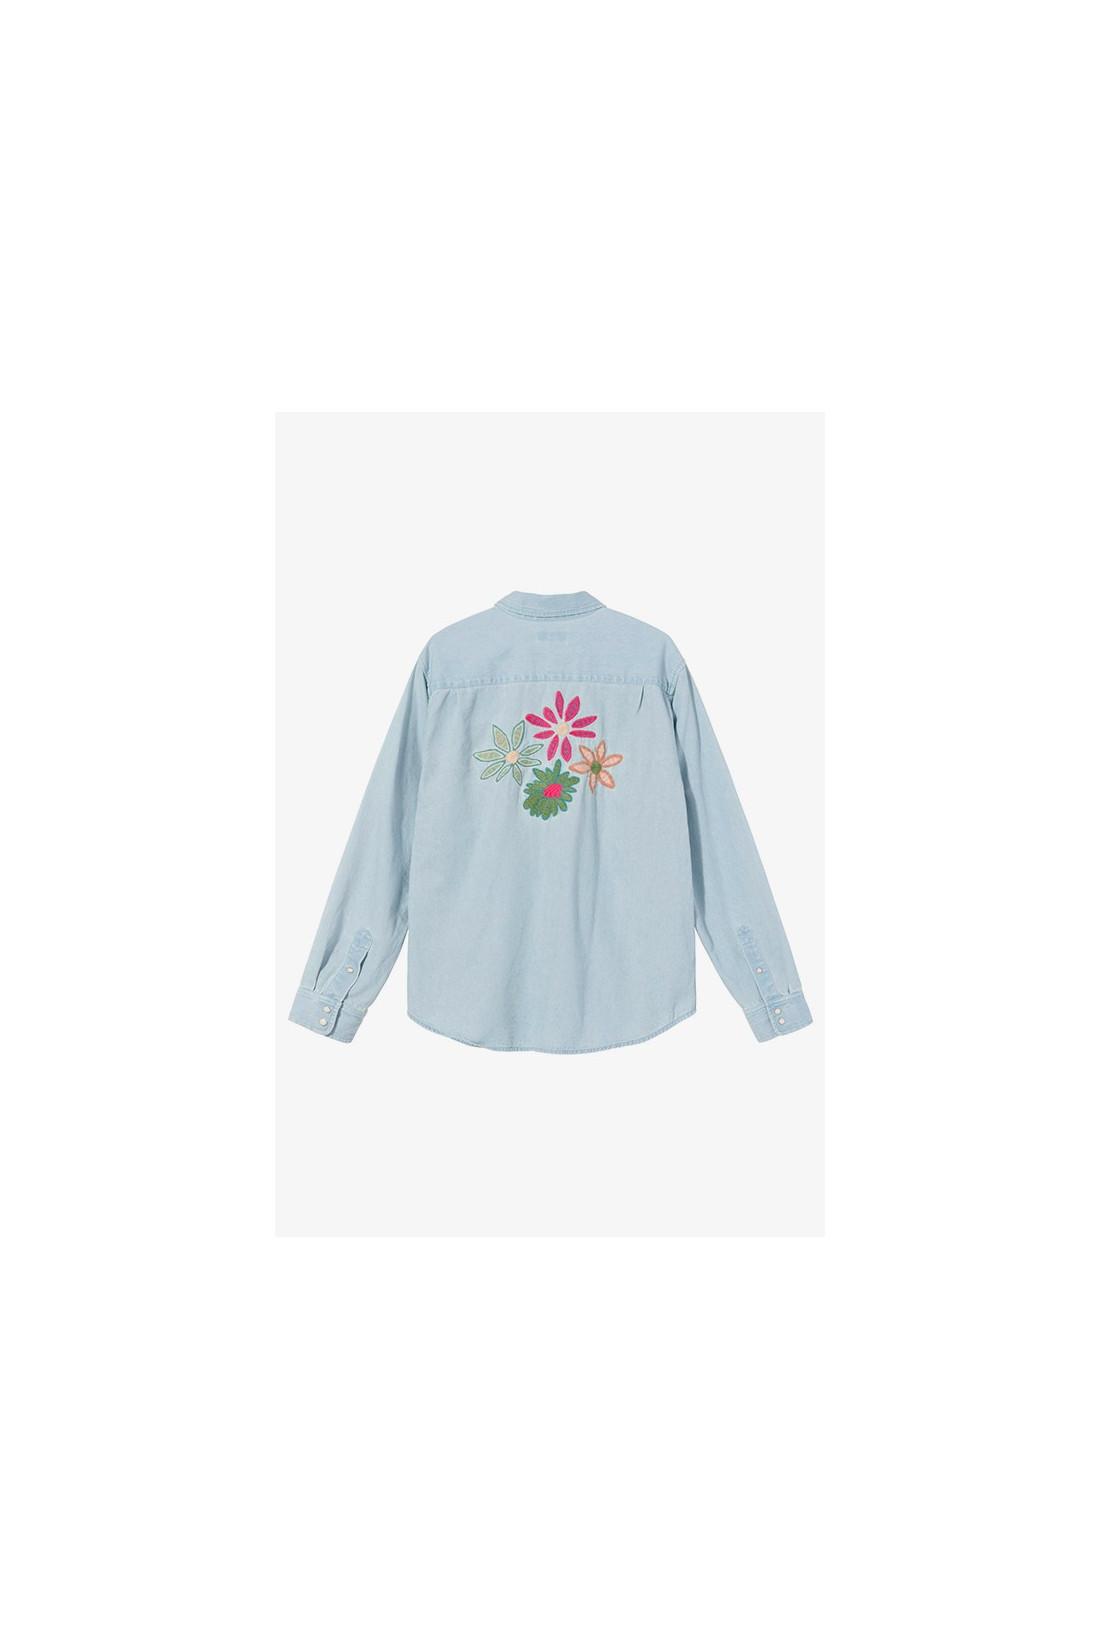 STUSSY / Flower emb. denim ls shirt Light blue